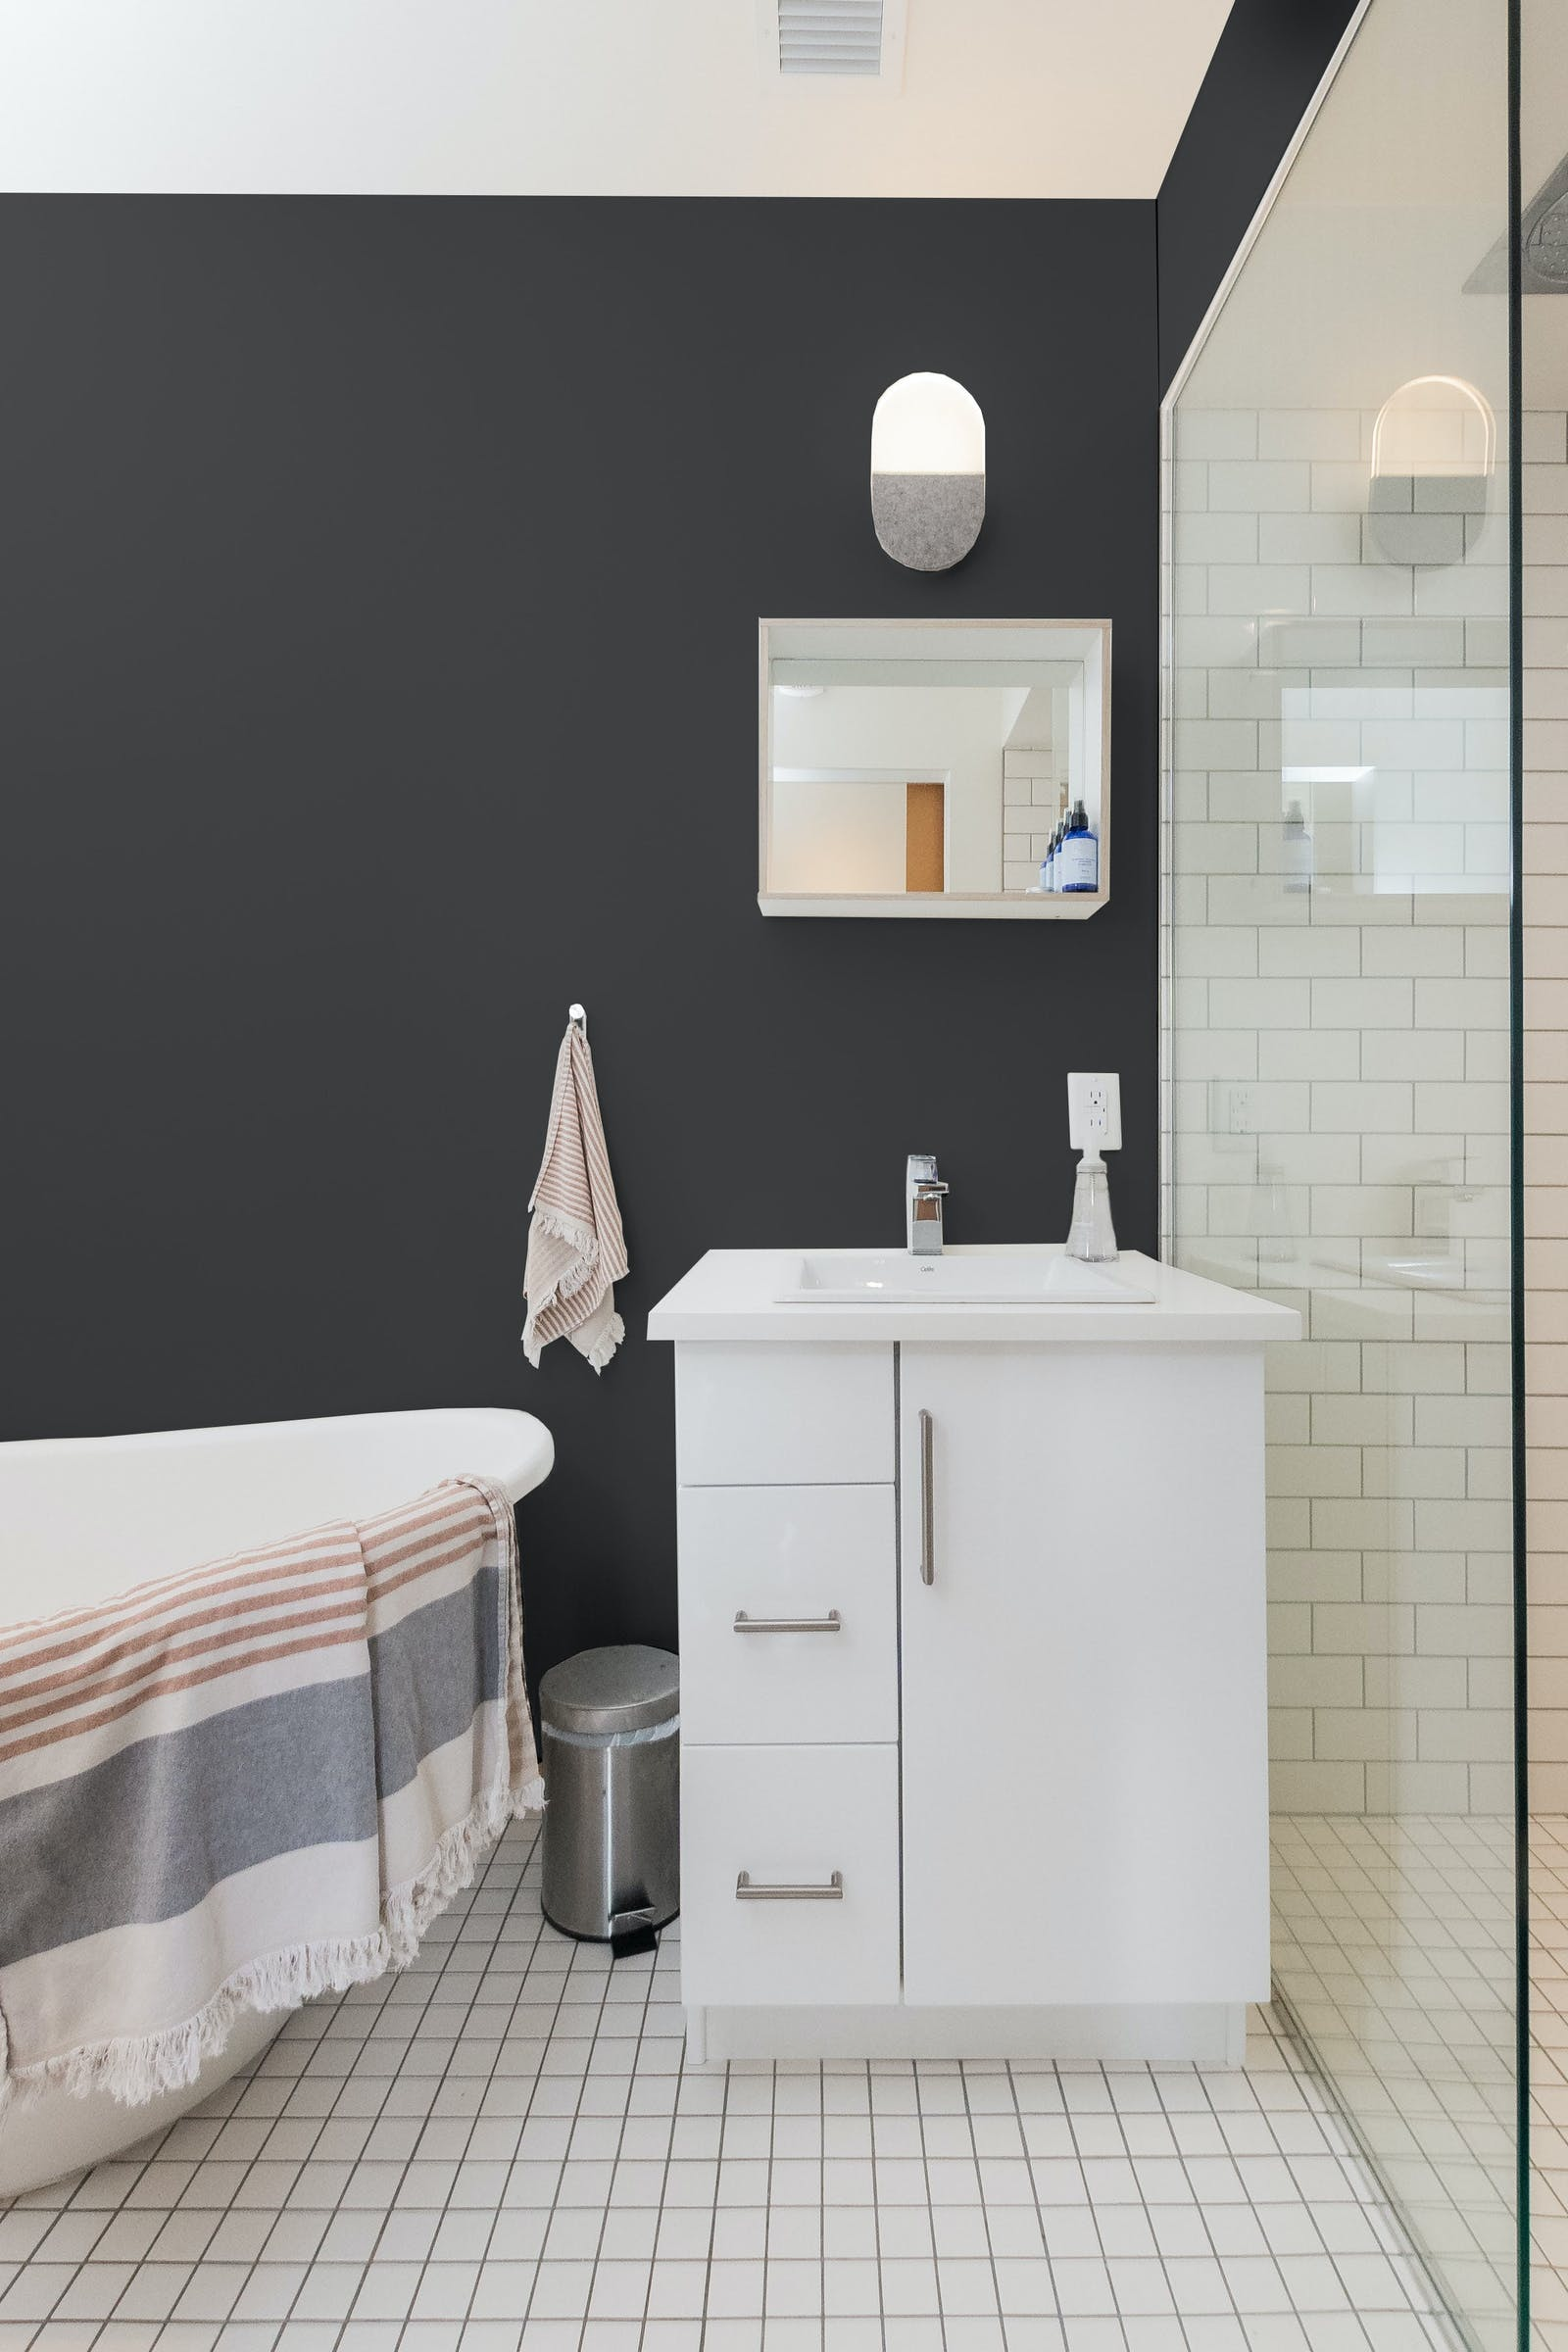 A black bathroom with white floors